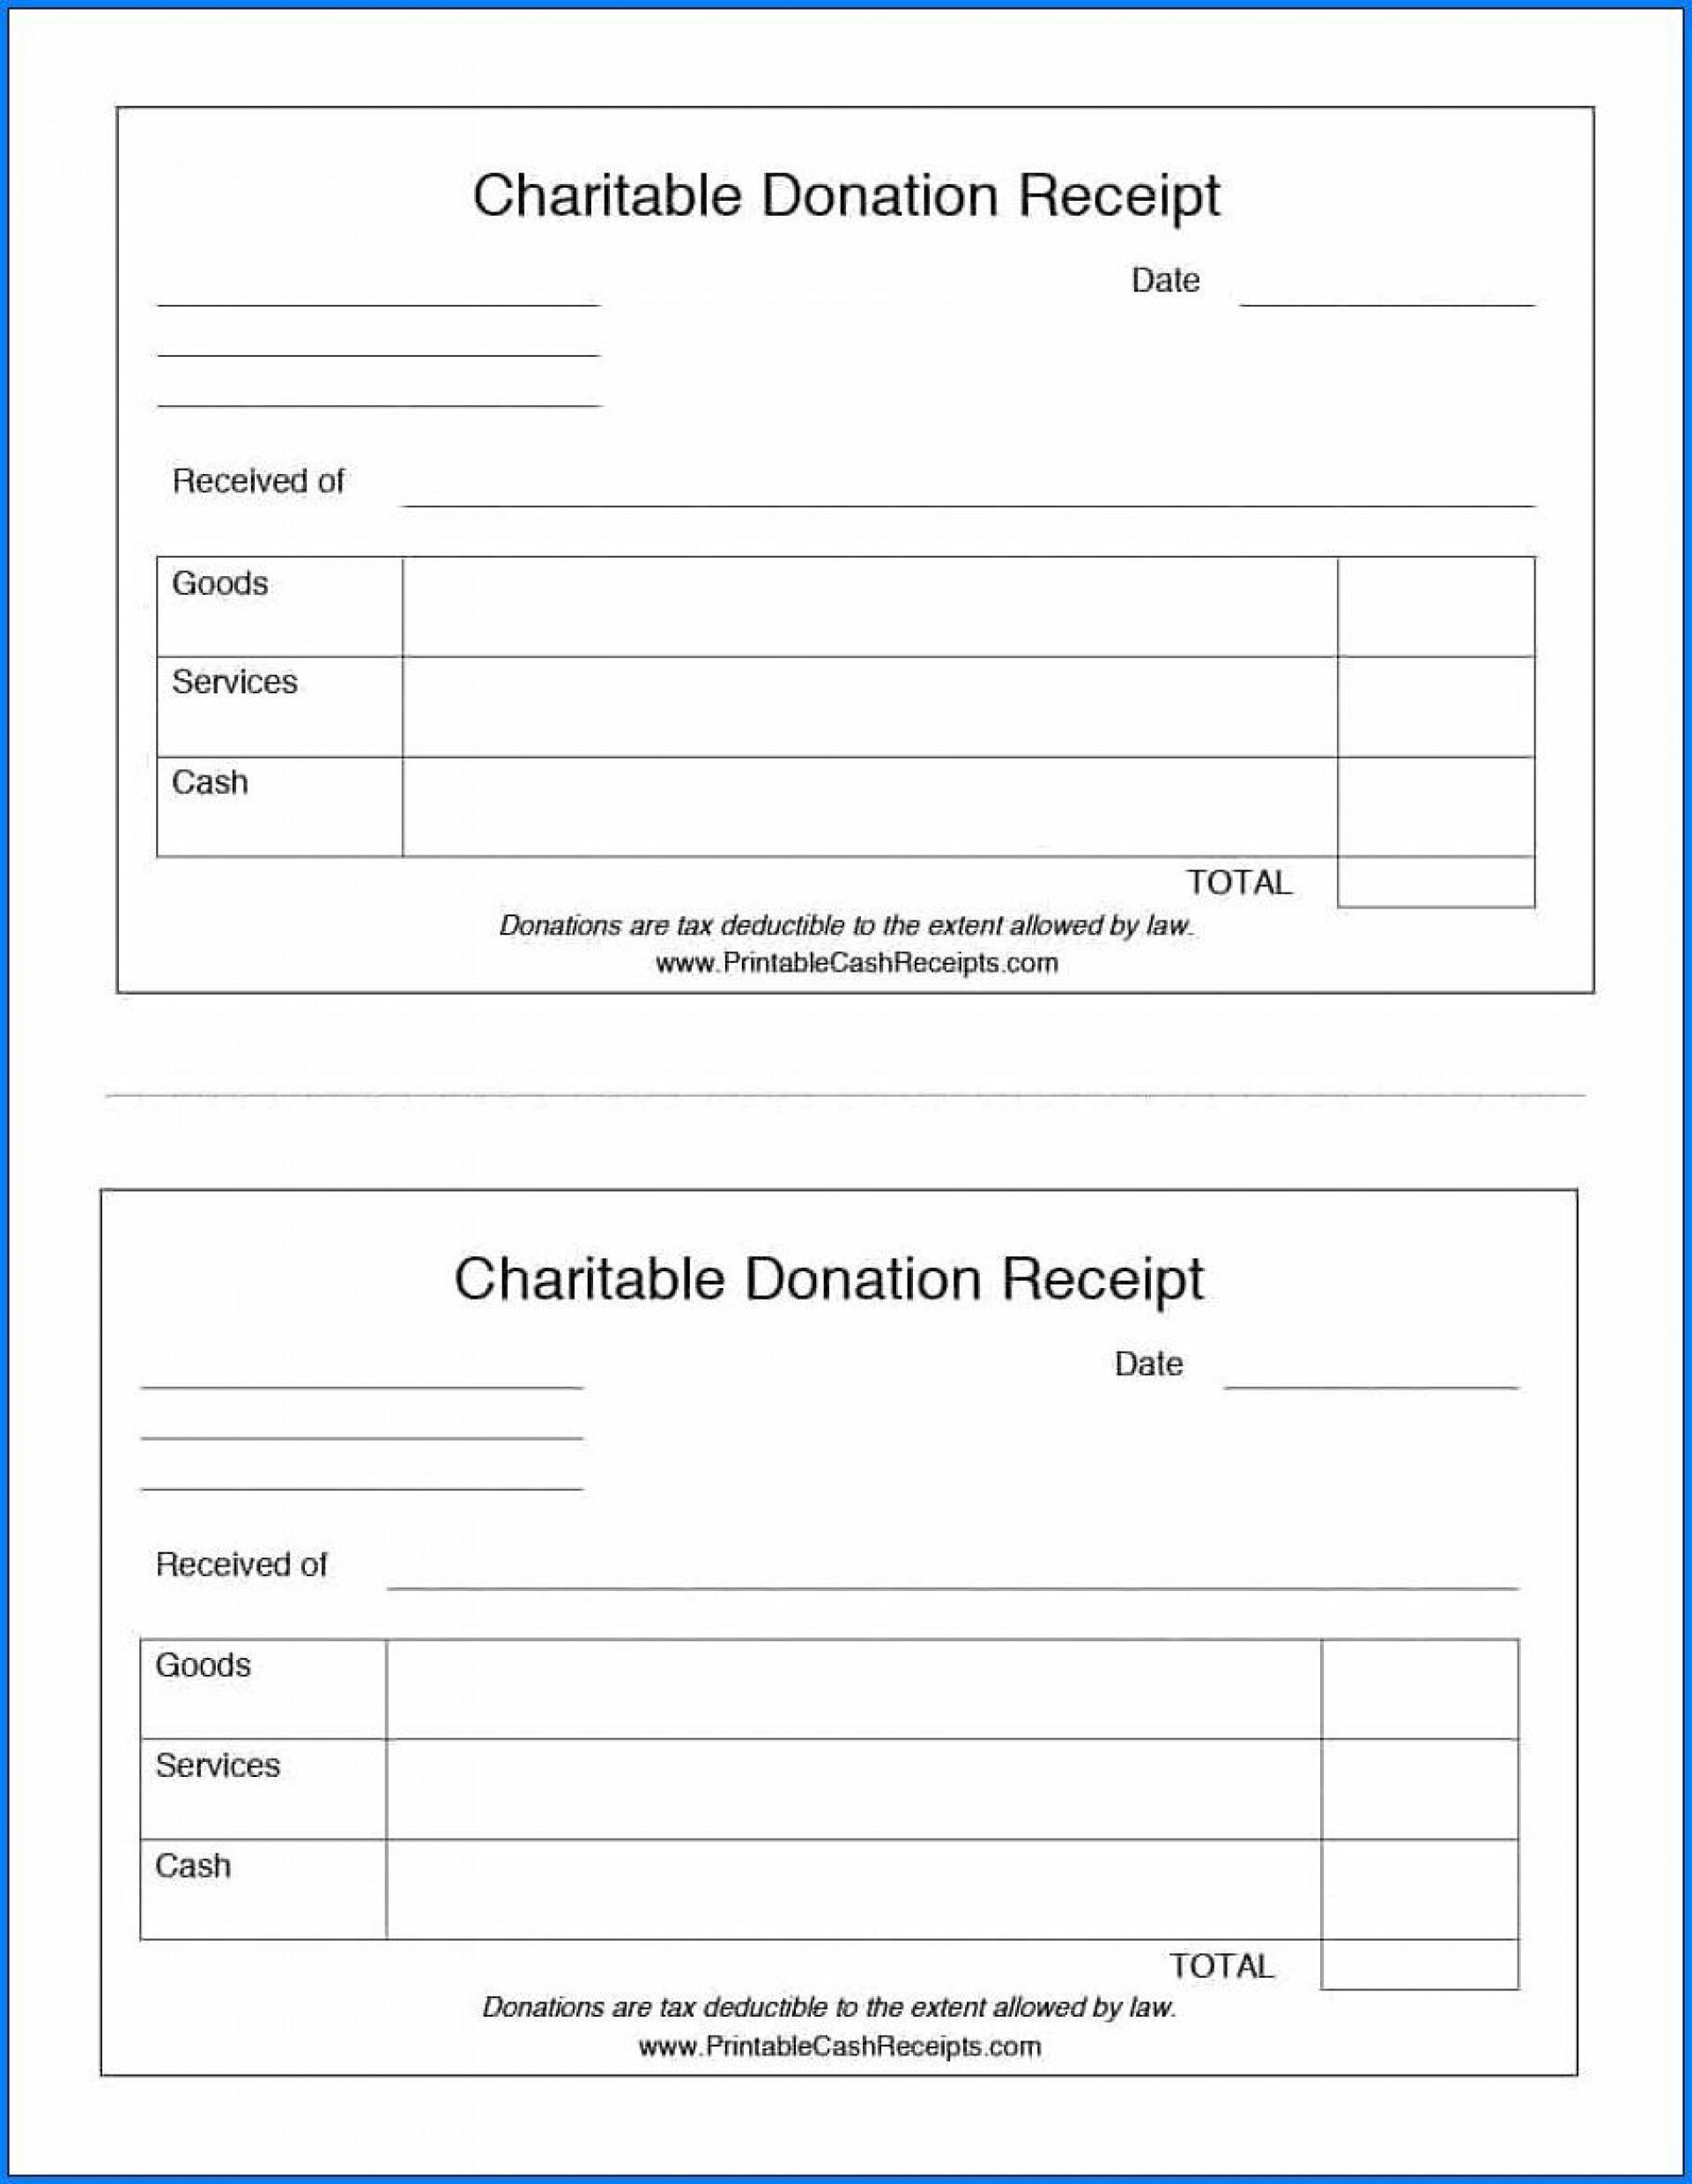 007 Dreaded Tax Deductible Donation Receipt Printable Image 1920